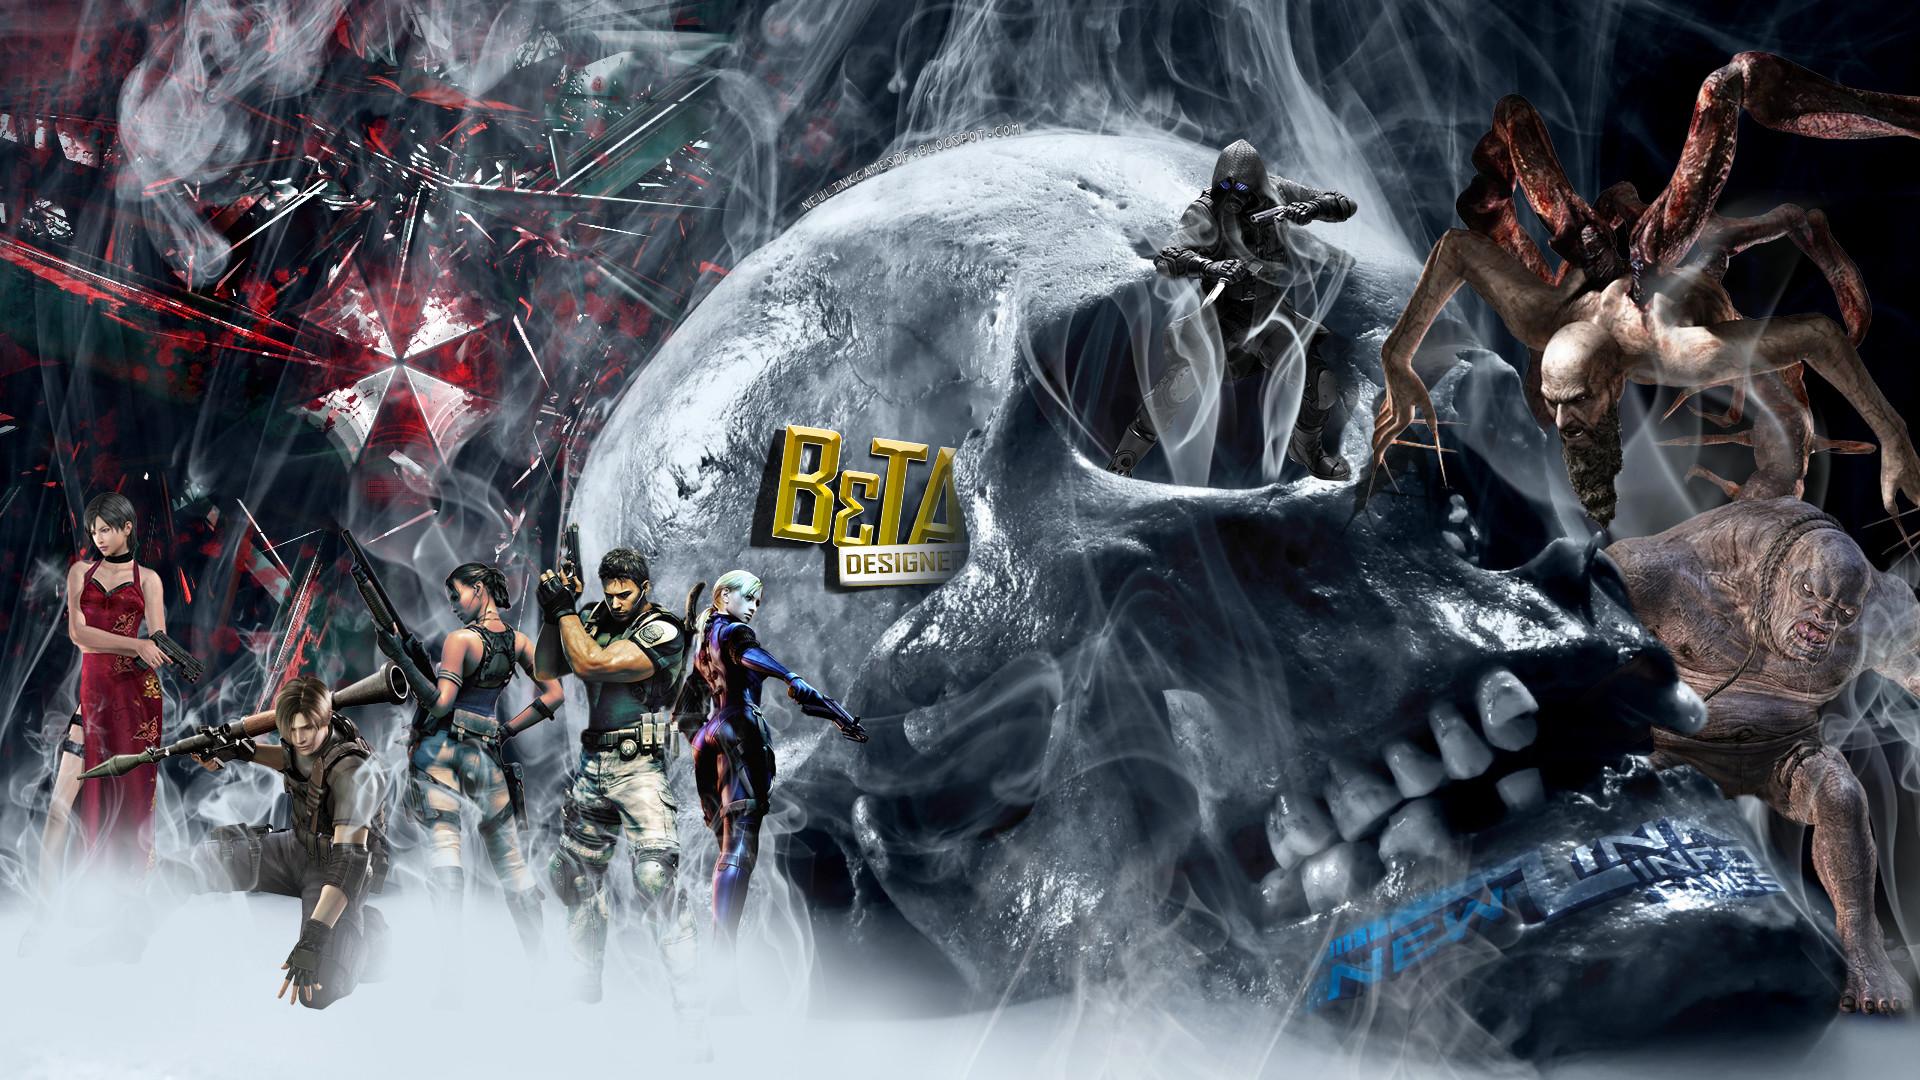 Wallpaper Resident Evil HD – by NewLinkGAMESDF on DeviantArt